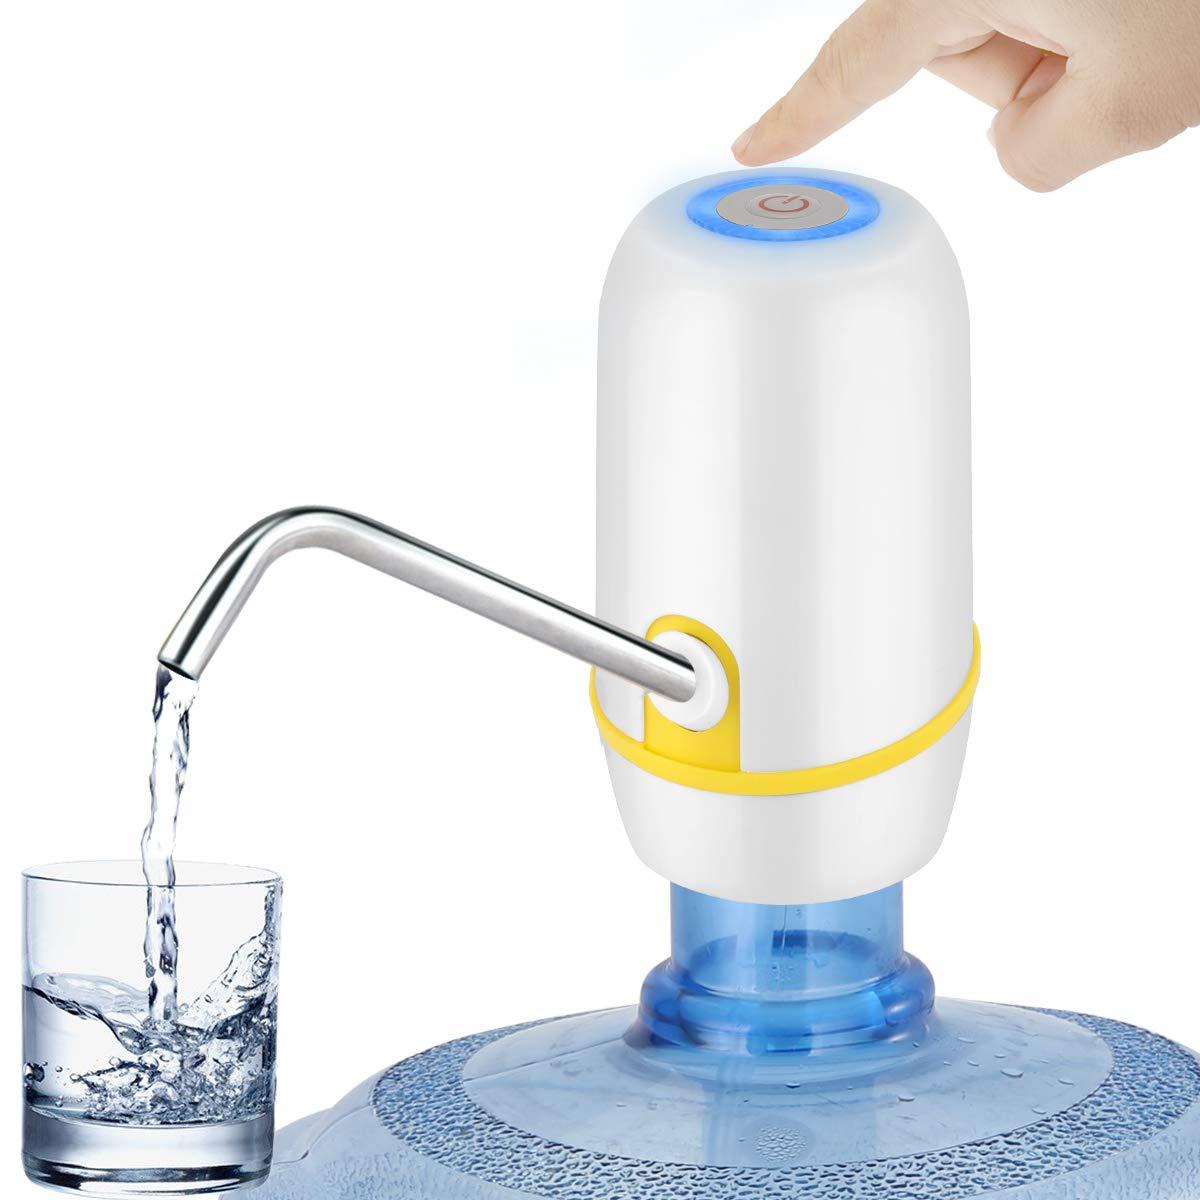 Tianhaik Automatic Electric Water Pump Dispenser, Electric Portable Water Dispenser for Universal 5 Gallon Bottle Office